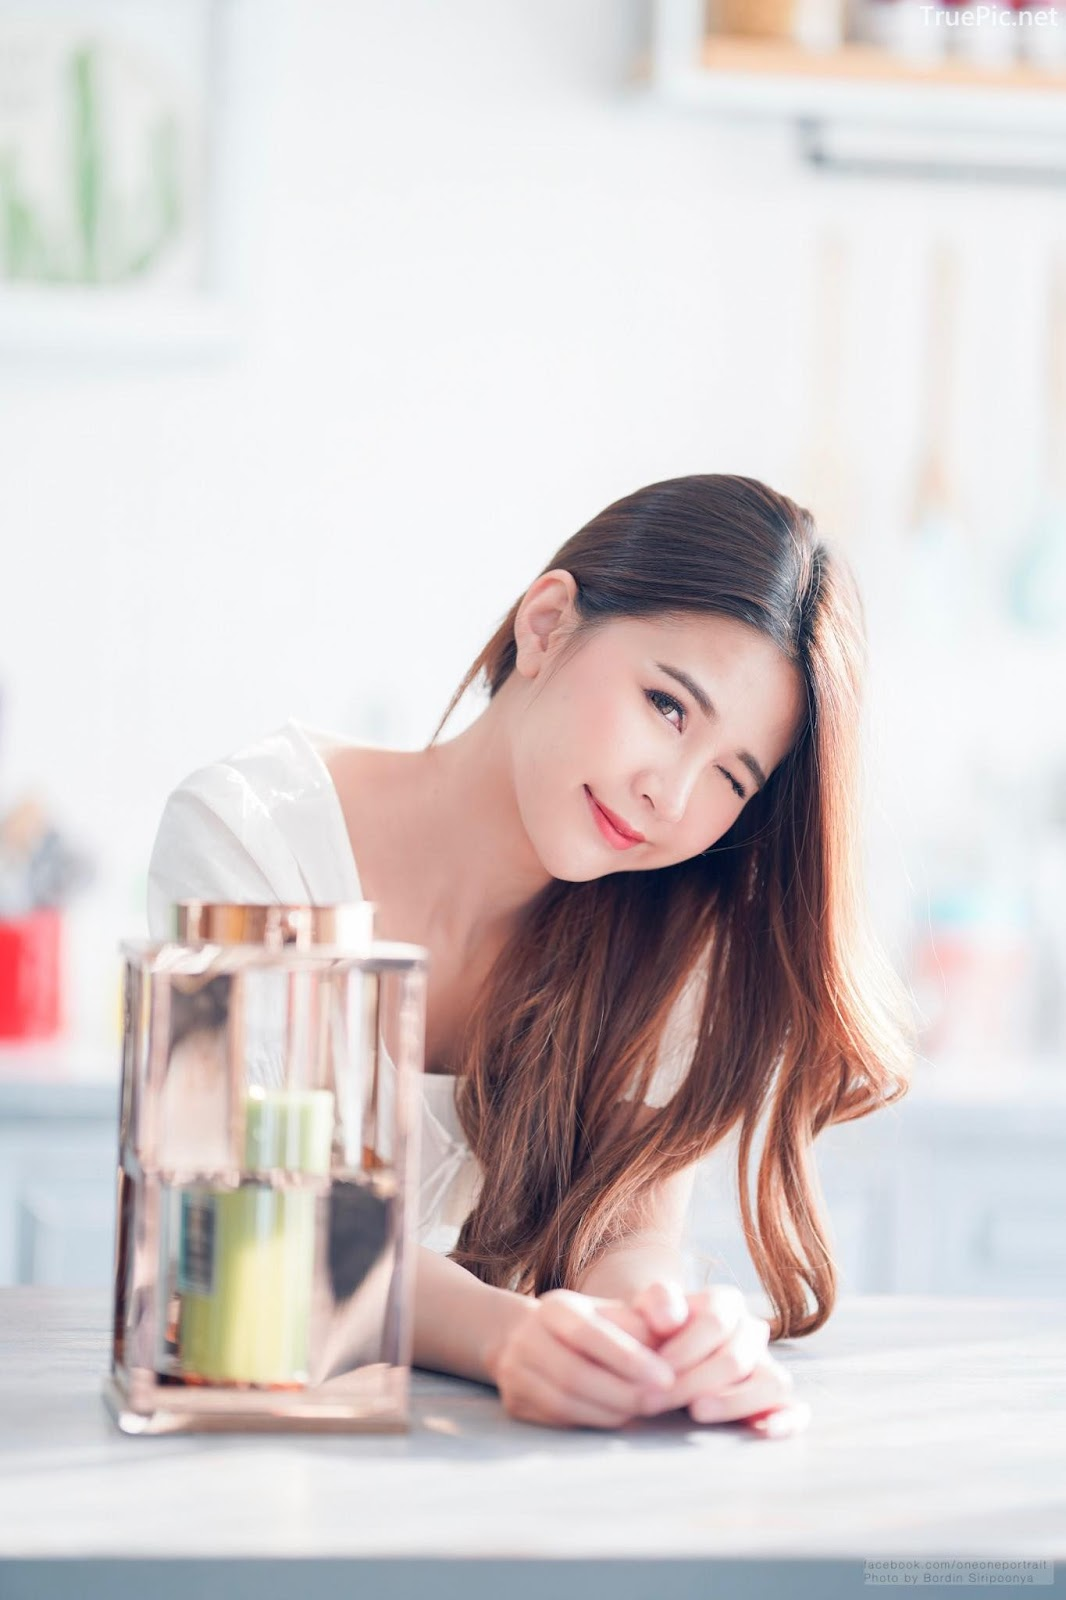 Thailand cute model Supansa Yoopradit (Lorpor) - Lovely smile girl - Picture 9